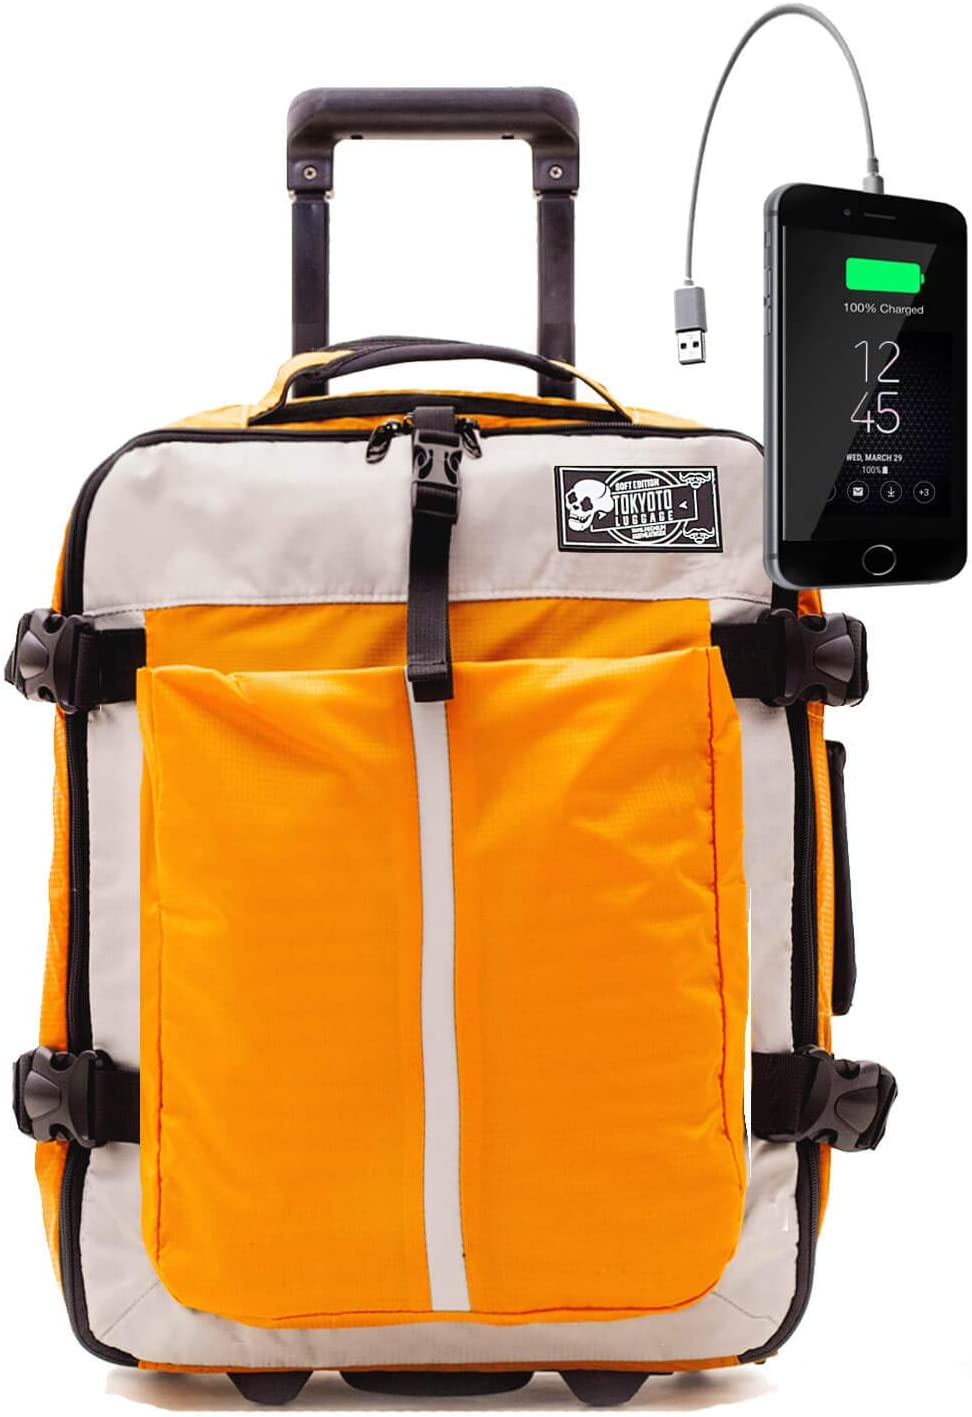 Maleta de Cabina Equipaje de Viaje de Mano Maleta Blanda de Nylon Duffel para Ryanair Easyjet 55x35x20 Trolley Juvenil by TOKYOTO Luggage 52cm Soft Yellow (Maleta + Cargador)